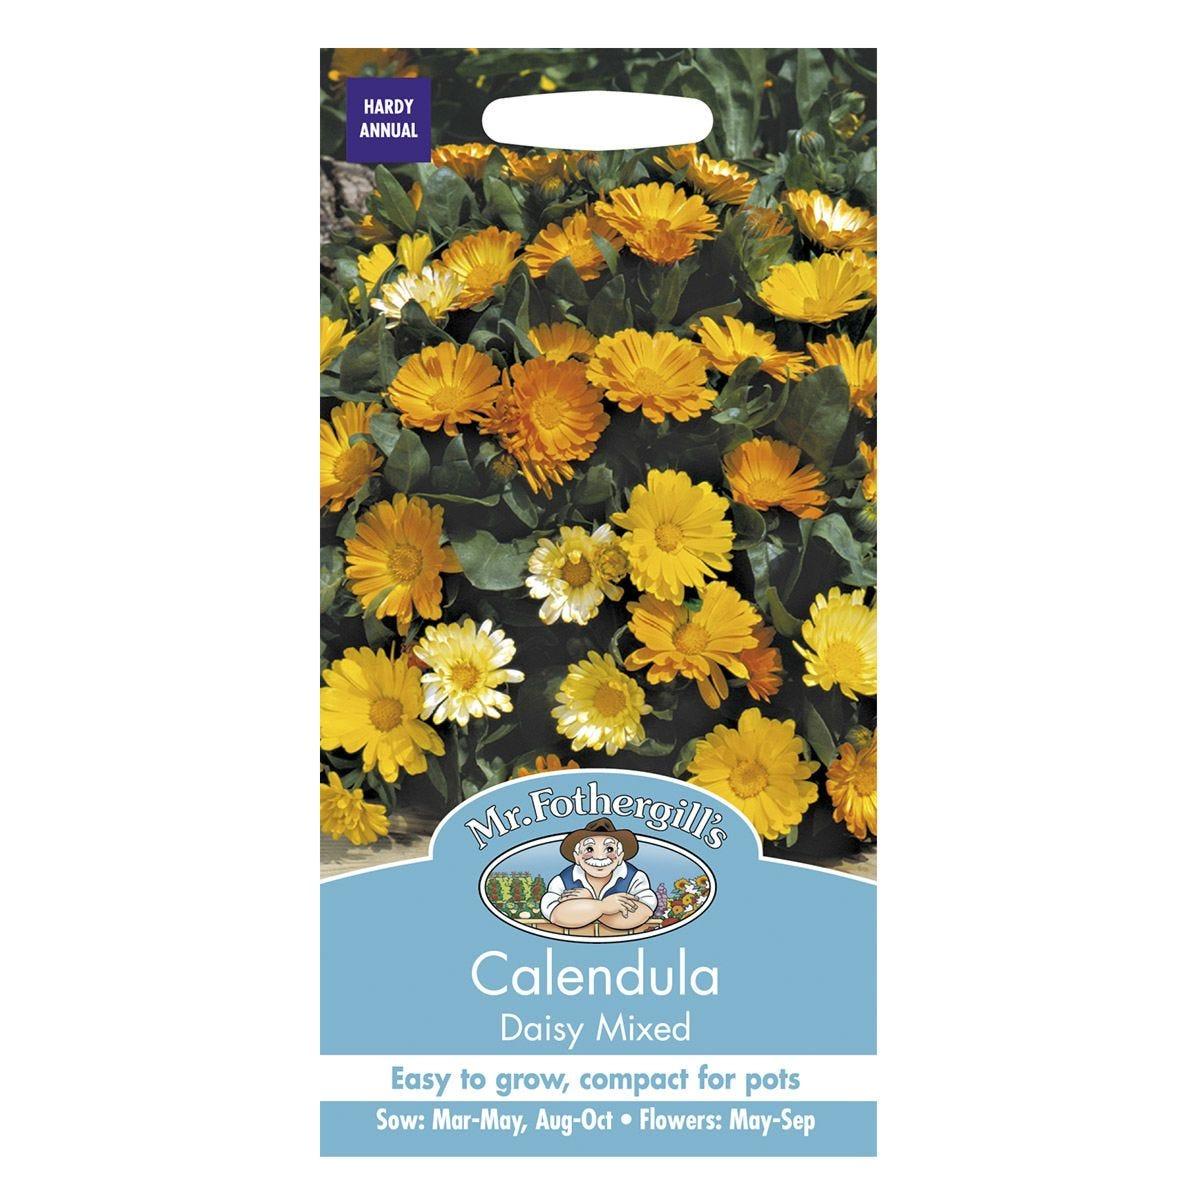 Mr Fothergill's Calendula Daisy Mixed Seeds